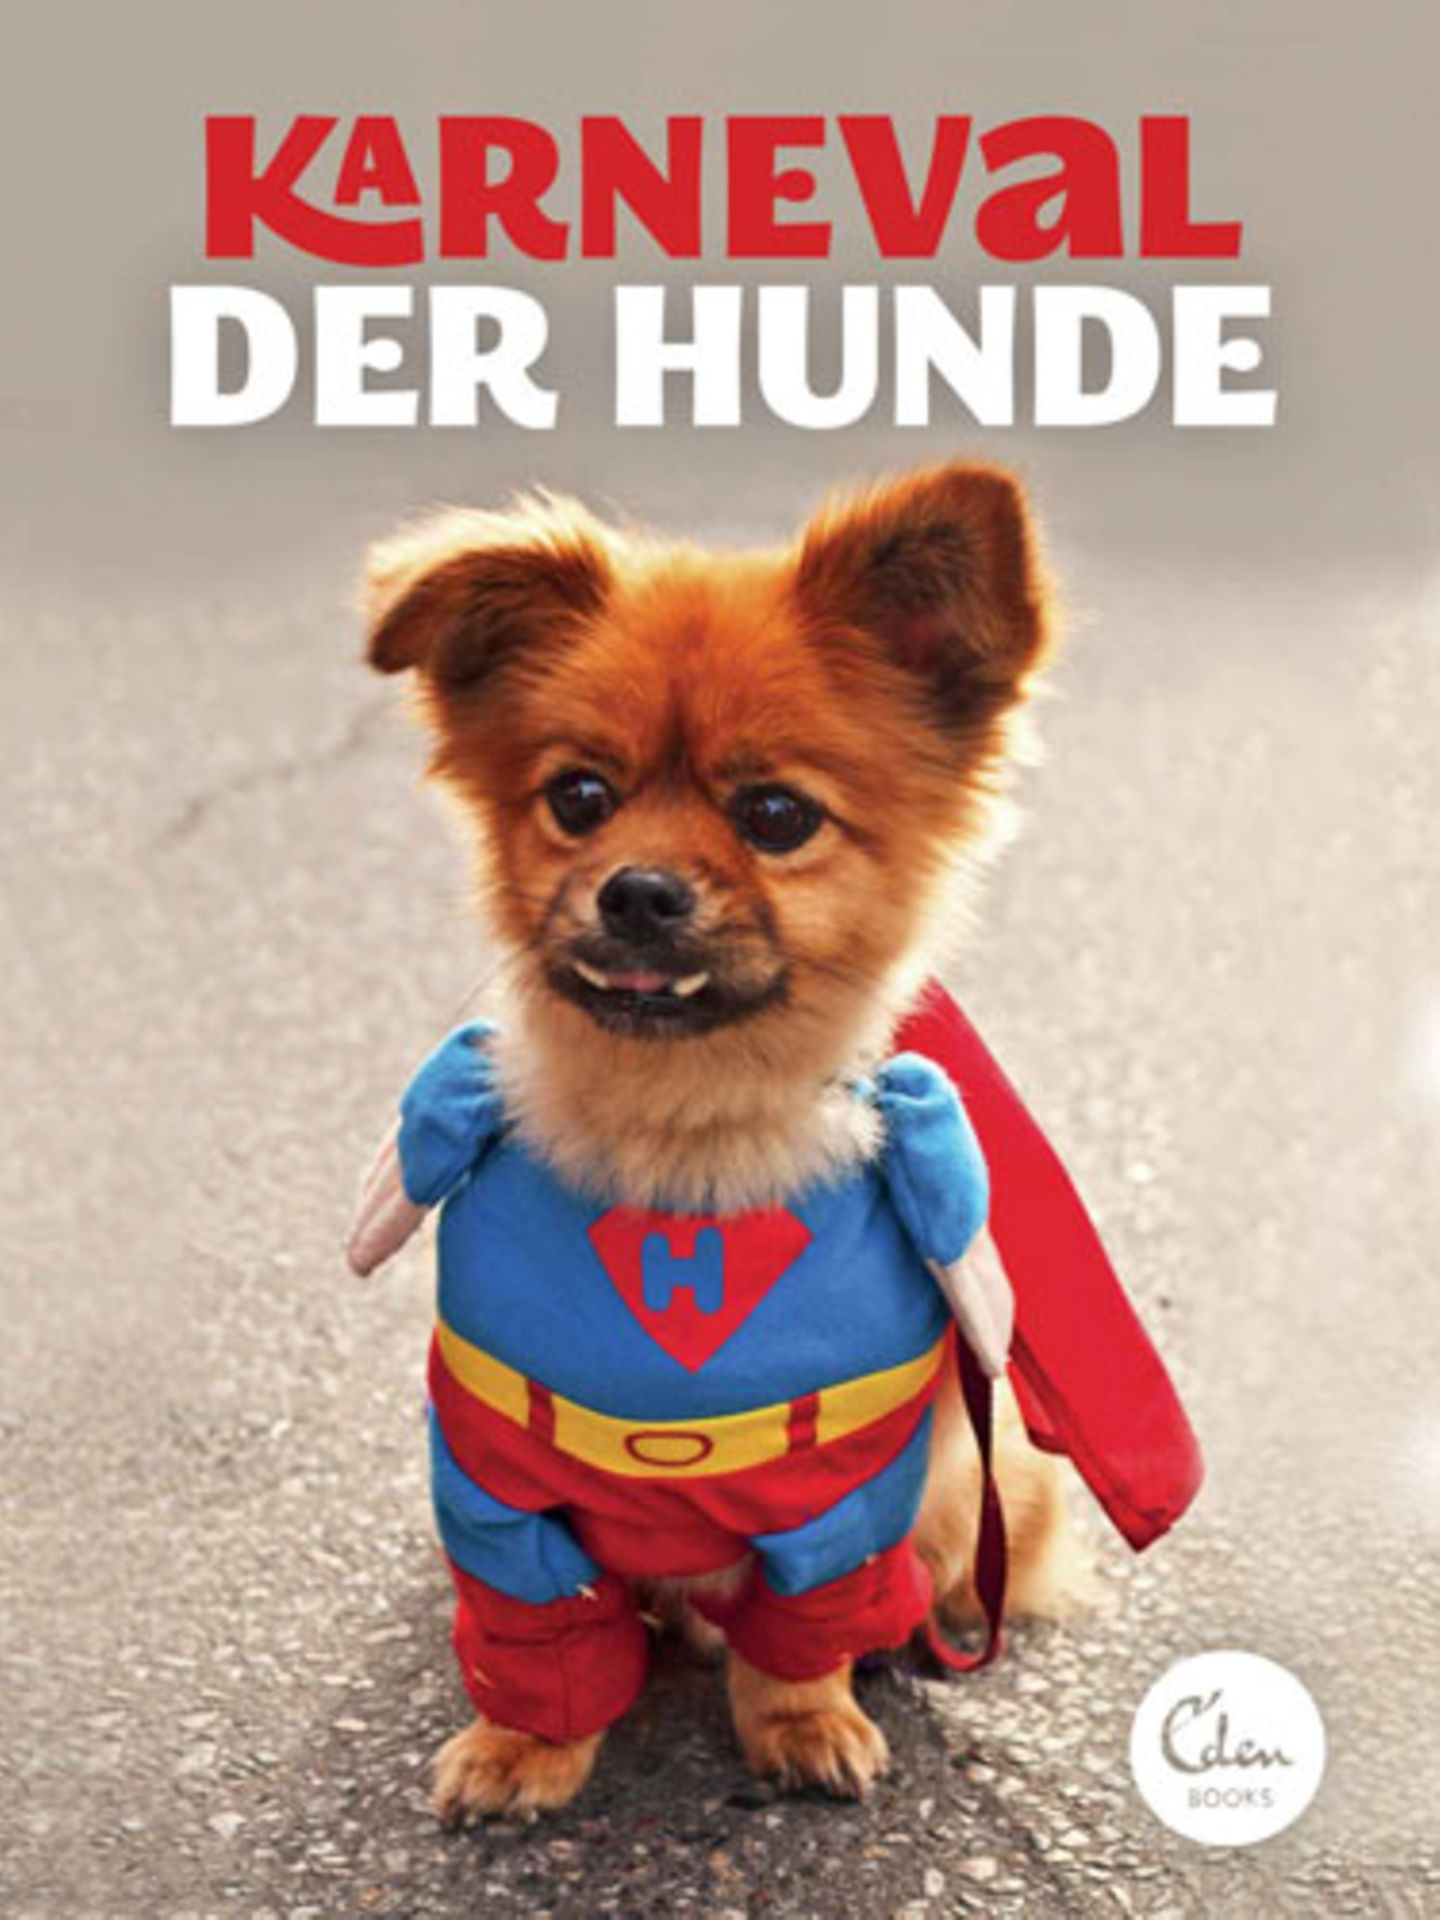 """Karneval der Hunde"", Eden Books, 9,95 Euro"